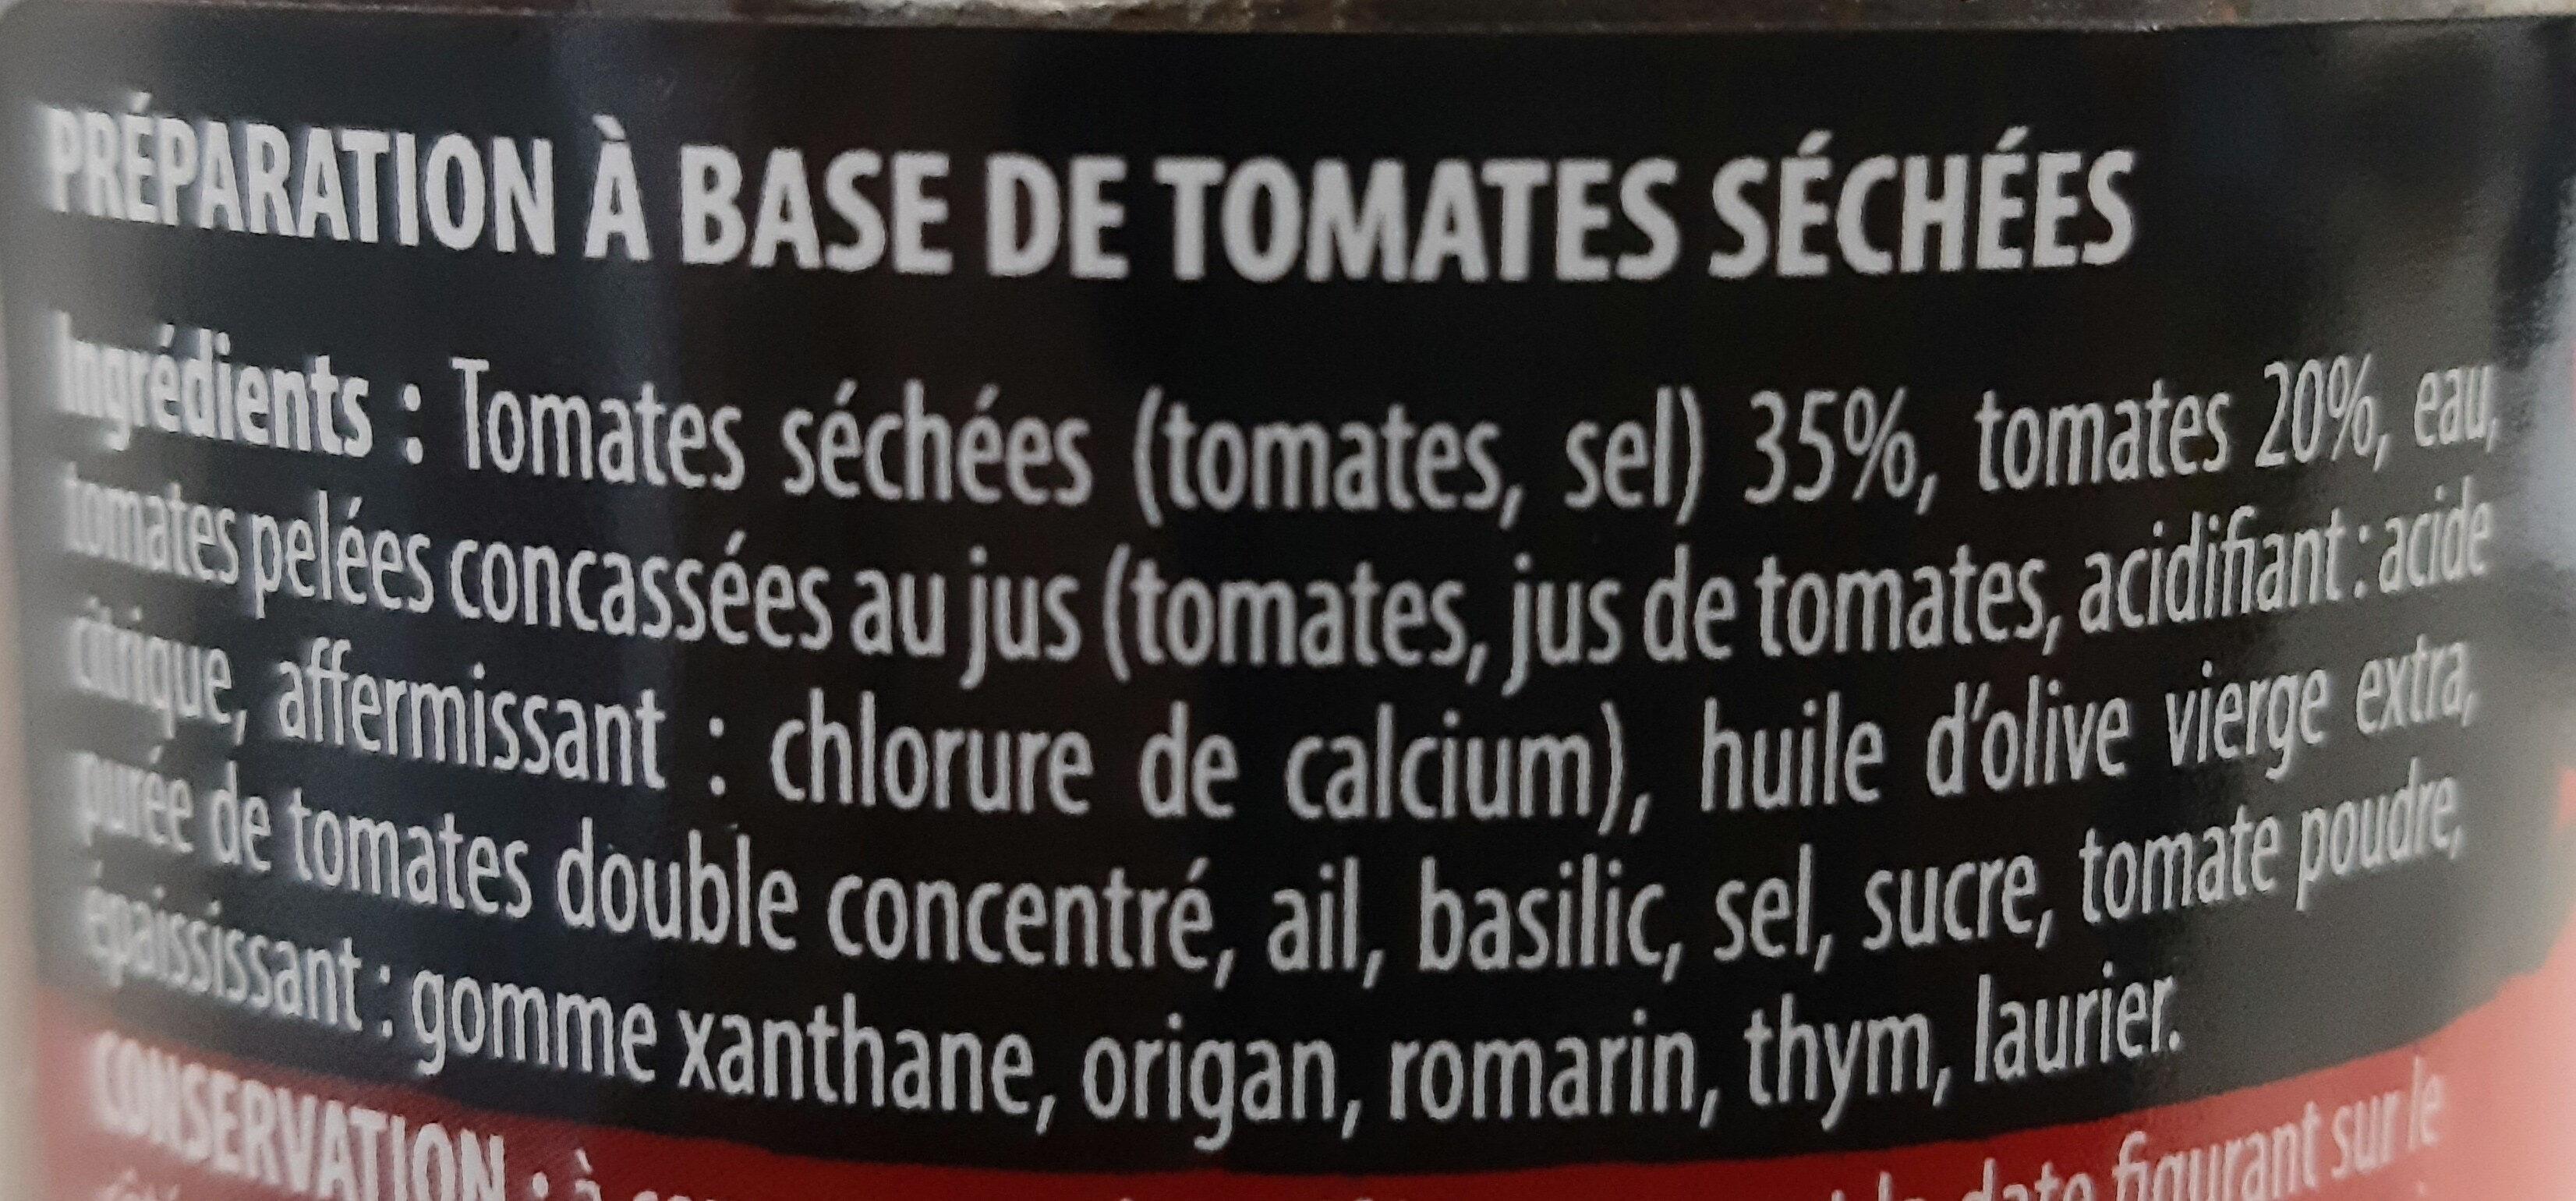 Légumes 'Apéro' tomates séchées - Inhaltsstoffe